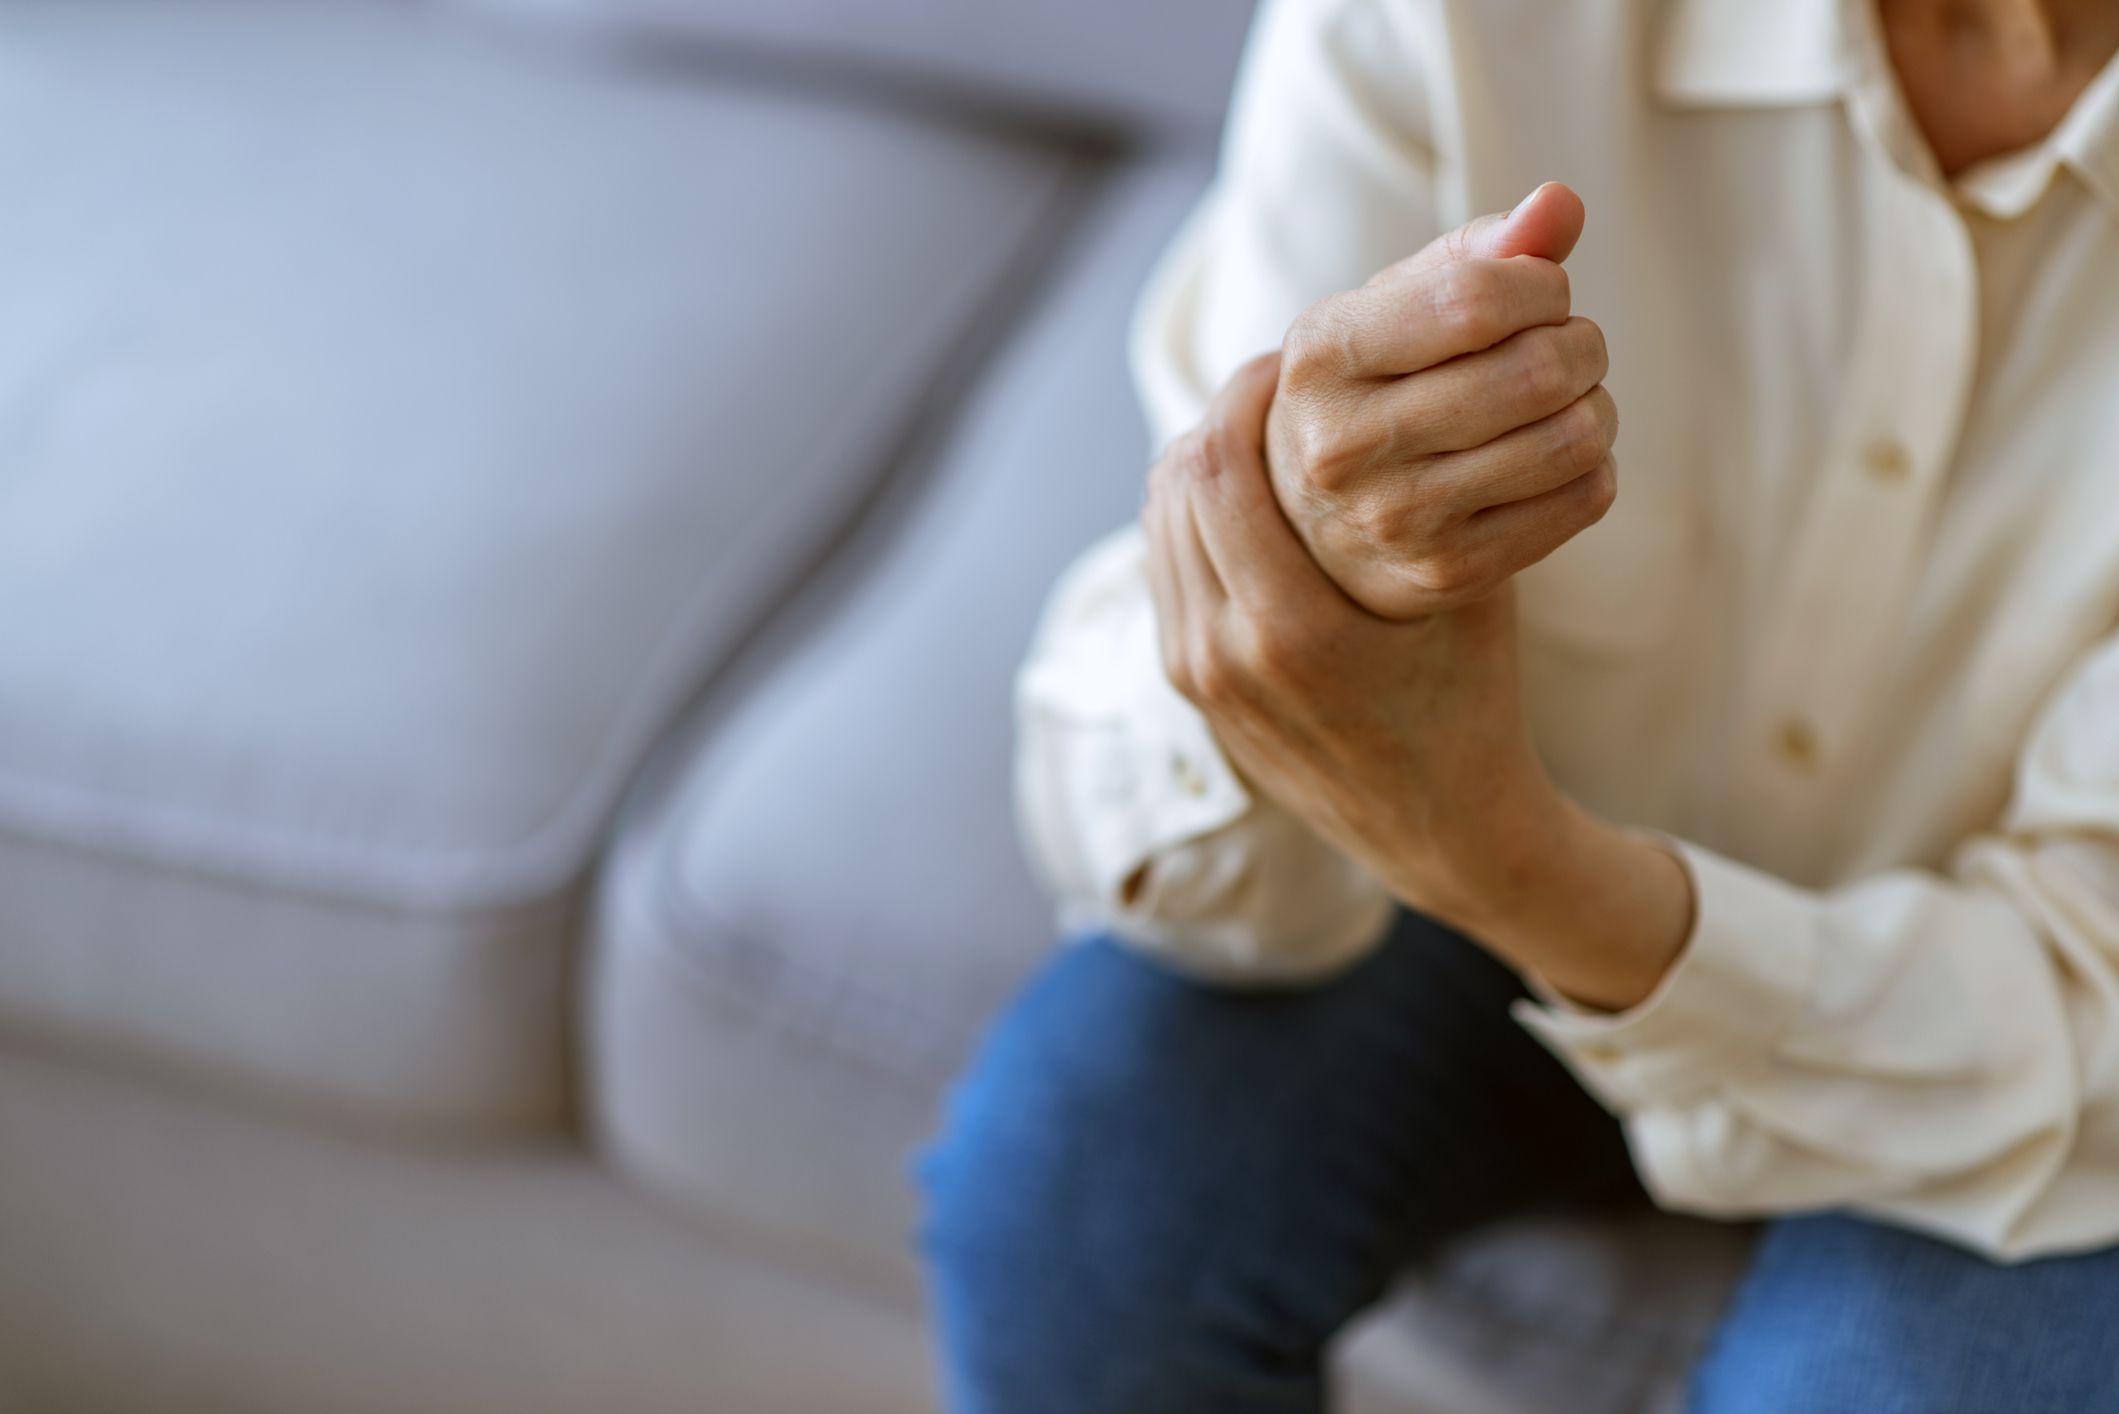 Woman holding her wrist symptomatic